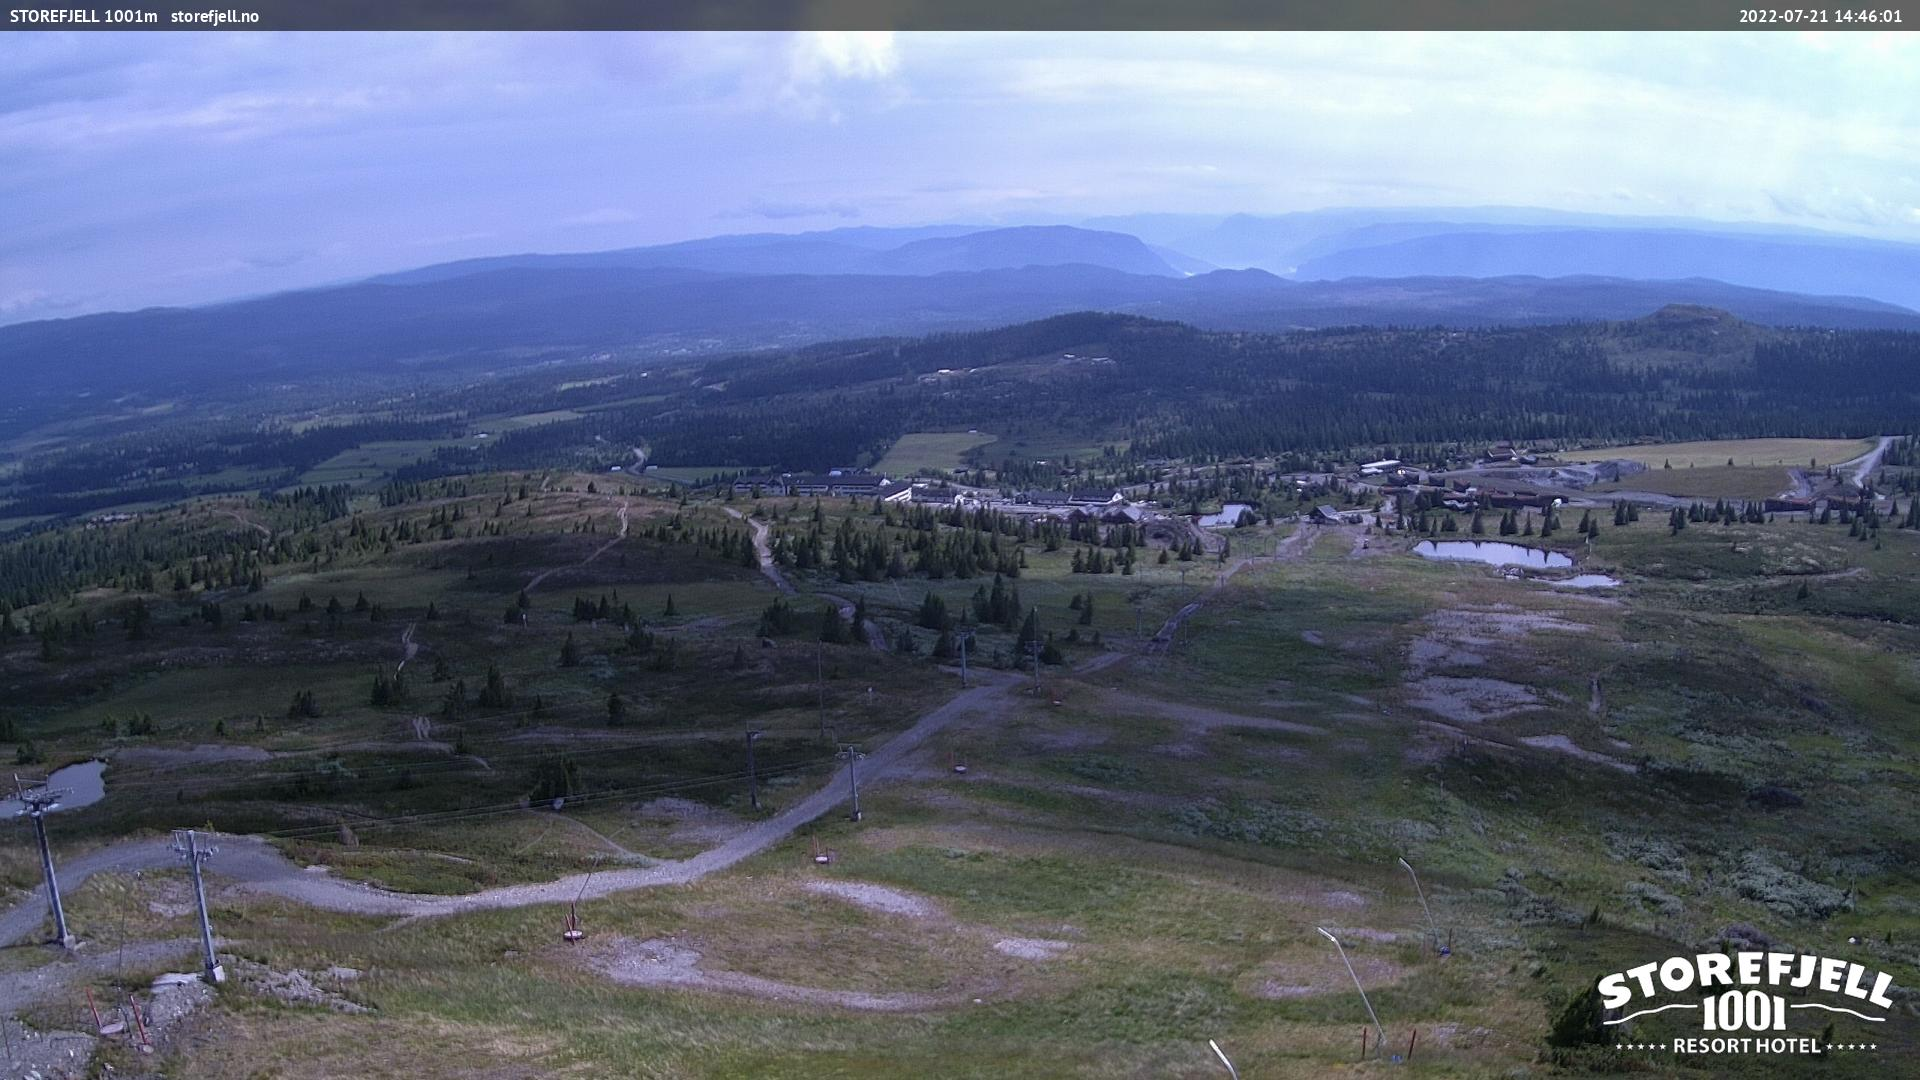 Webcam Storefjelltoppen, Gol, Buskerud, Norwegen